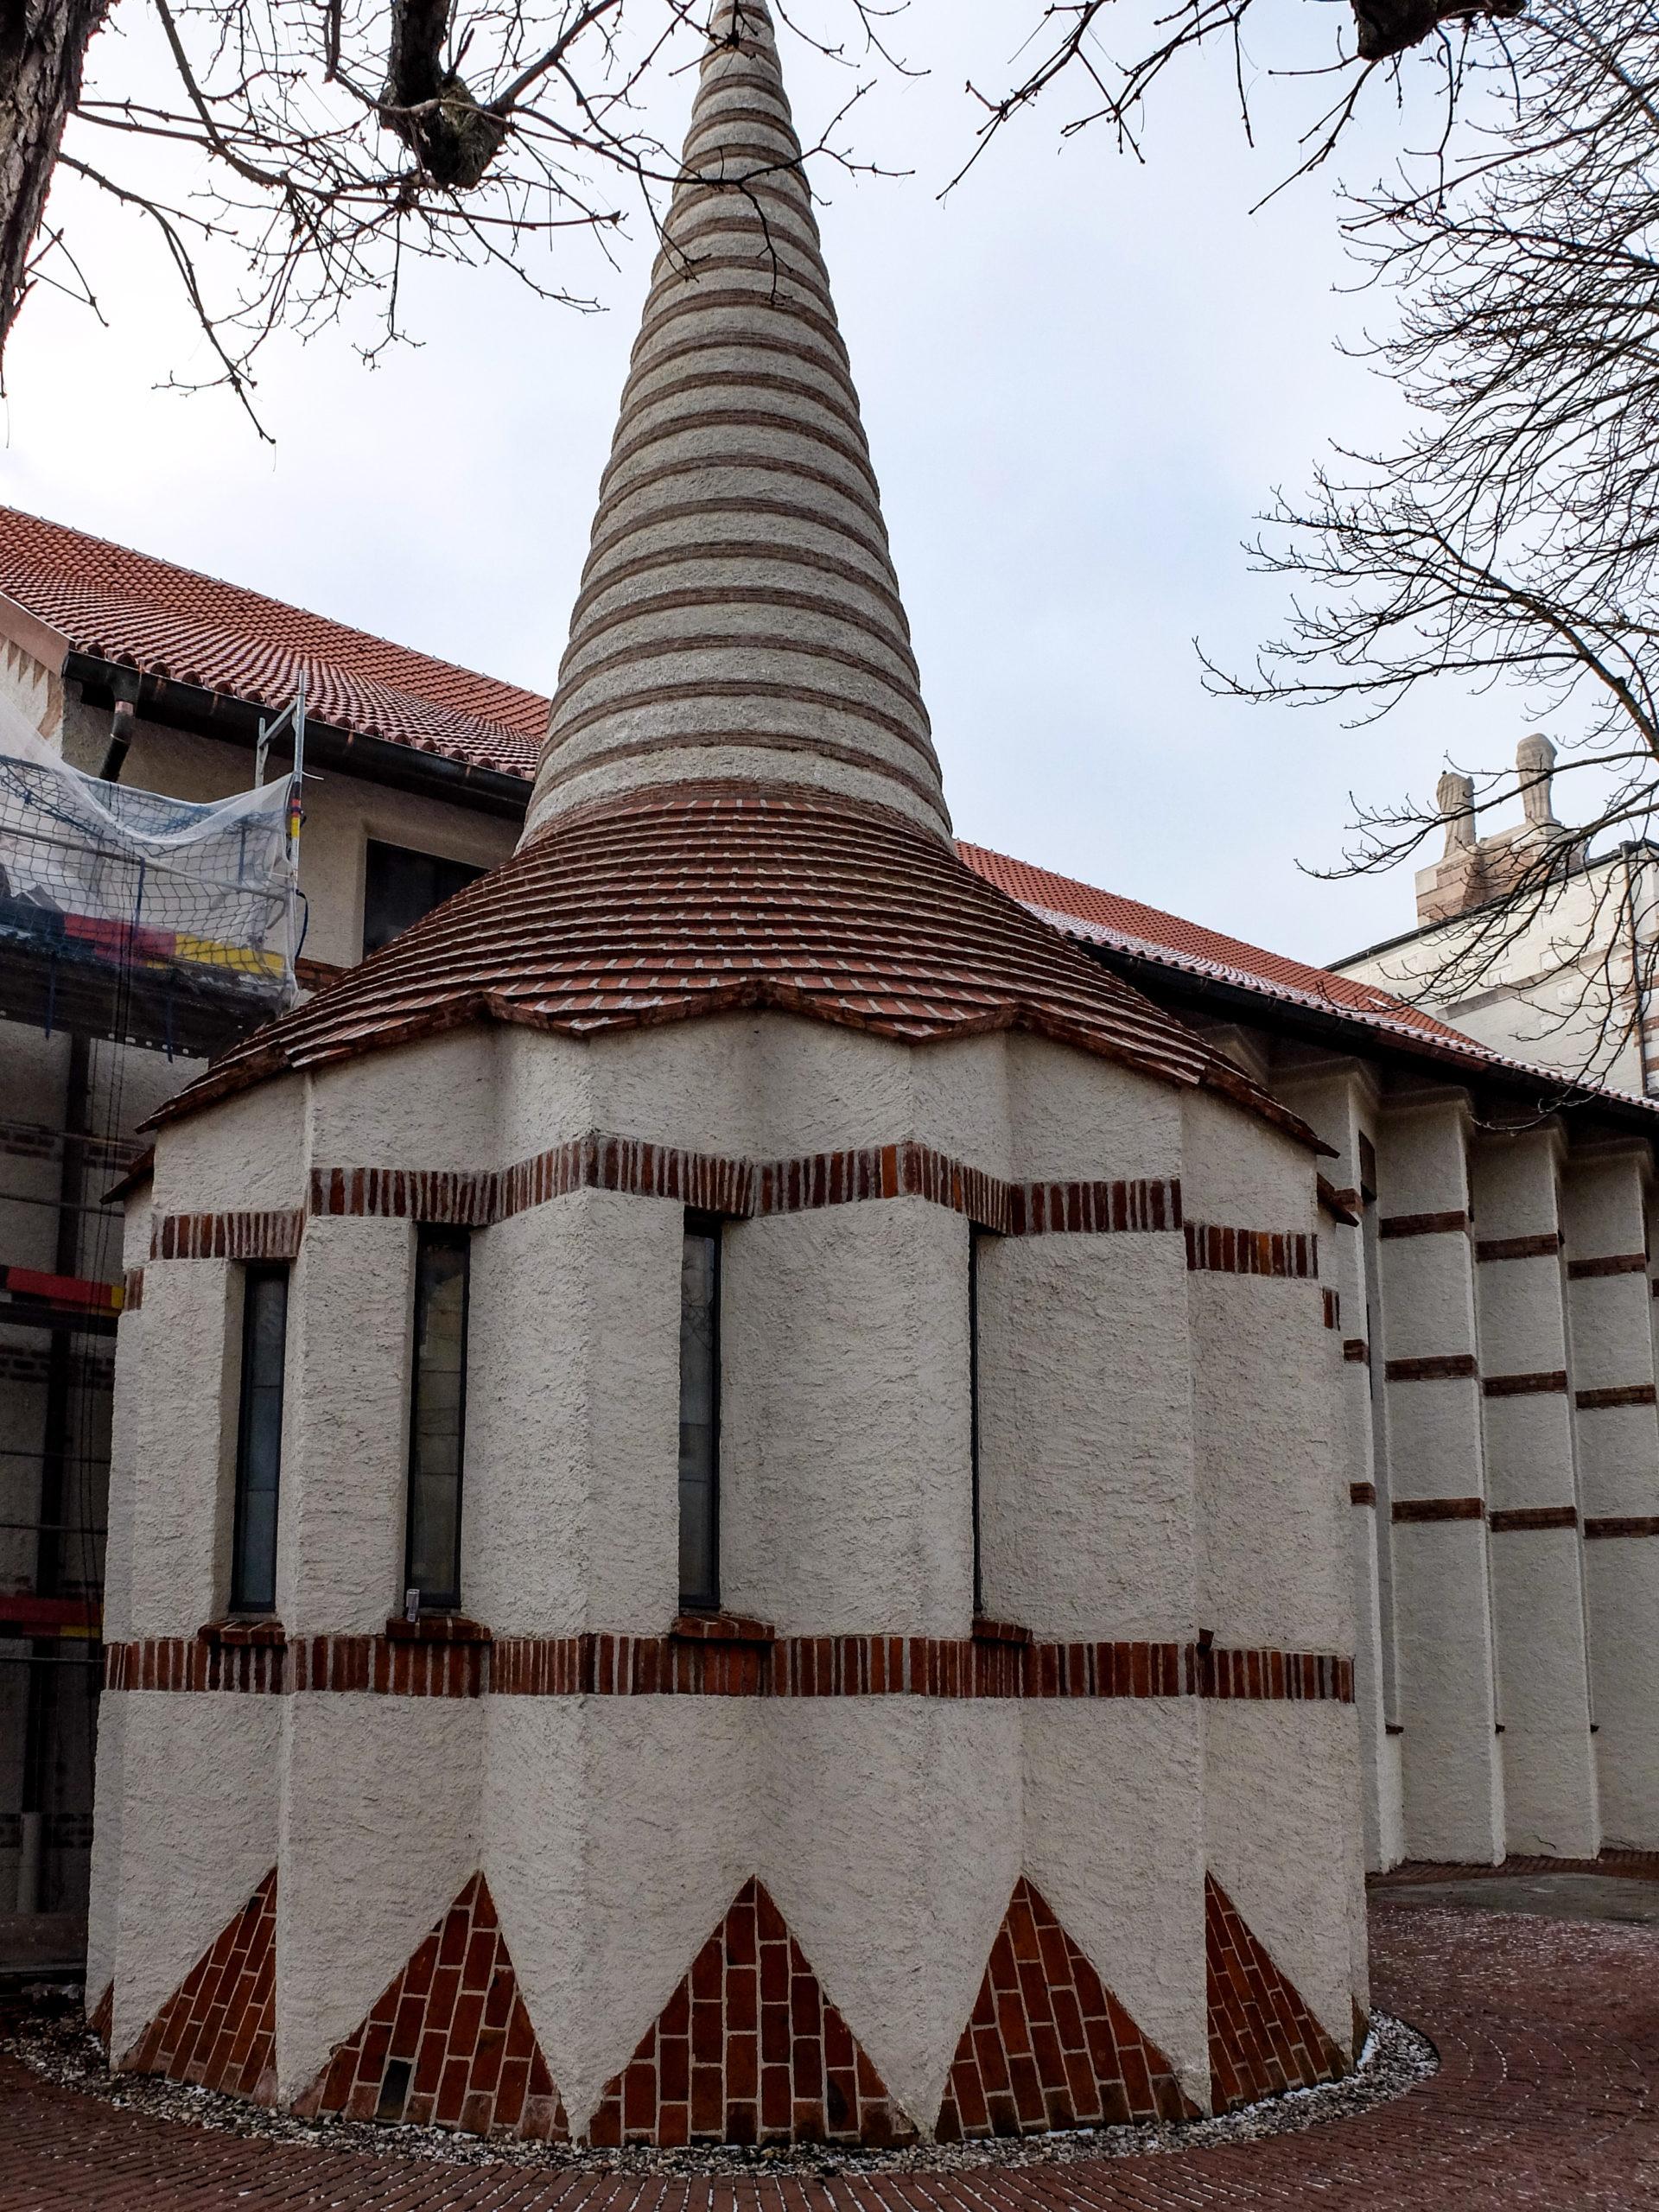 Katholische Pfarrkirche Sankt Johann Baptist, 1922-1926. Architekt: Dominikus Böhm